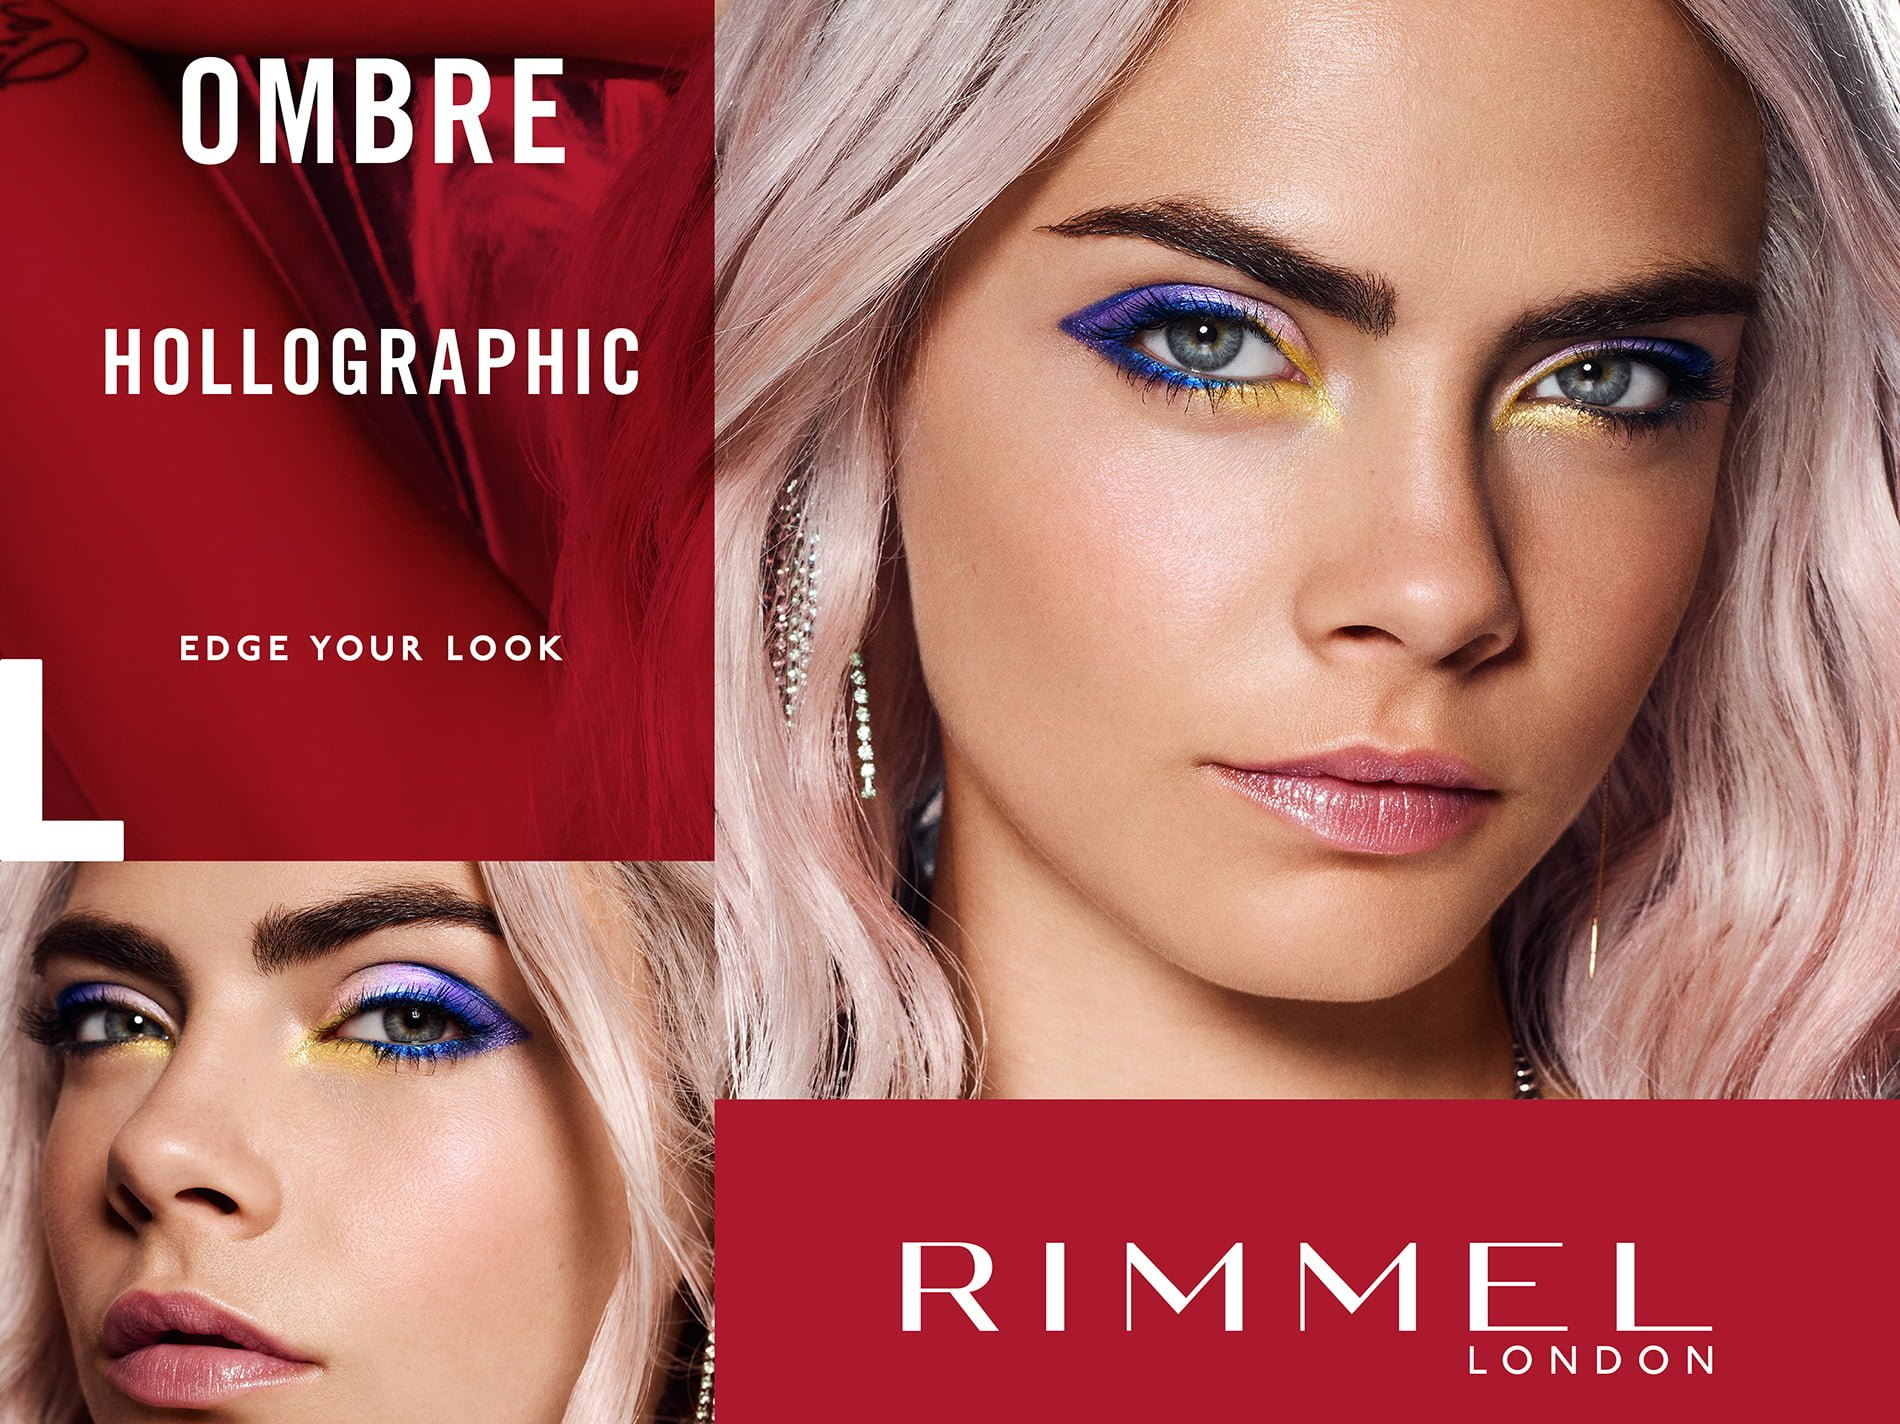 women modelling rimmel london ombre hollographic make up